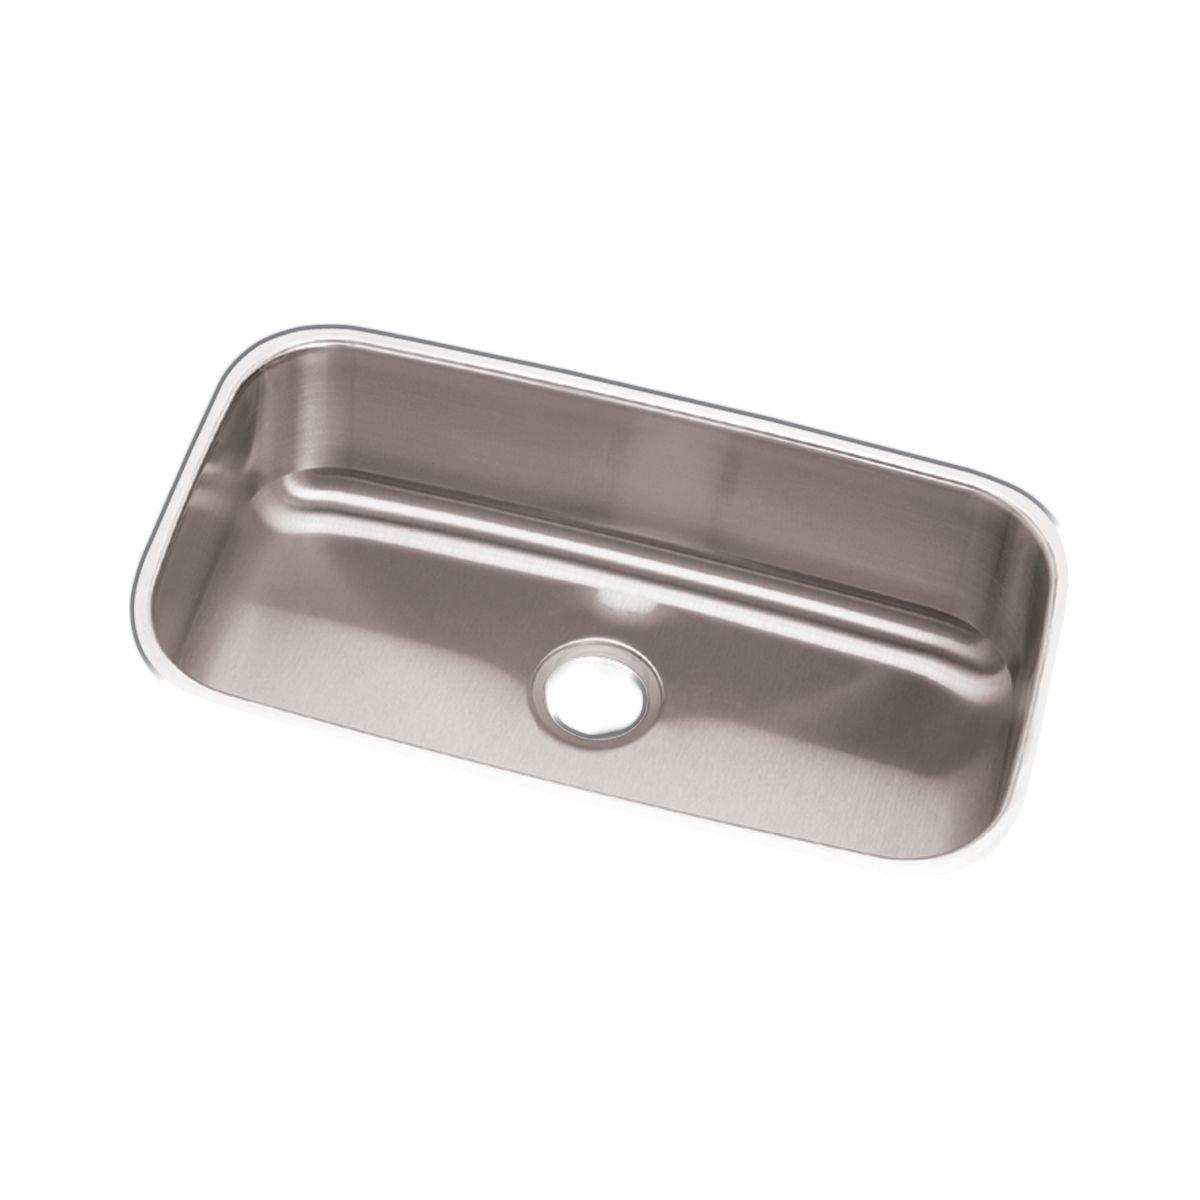 Revere RCFU2816 Single Bowl Undermount Stainless Steel Sink ...